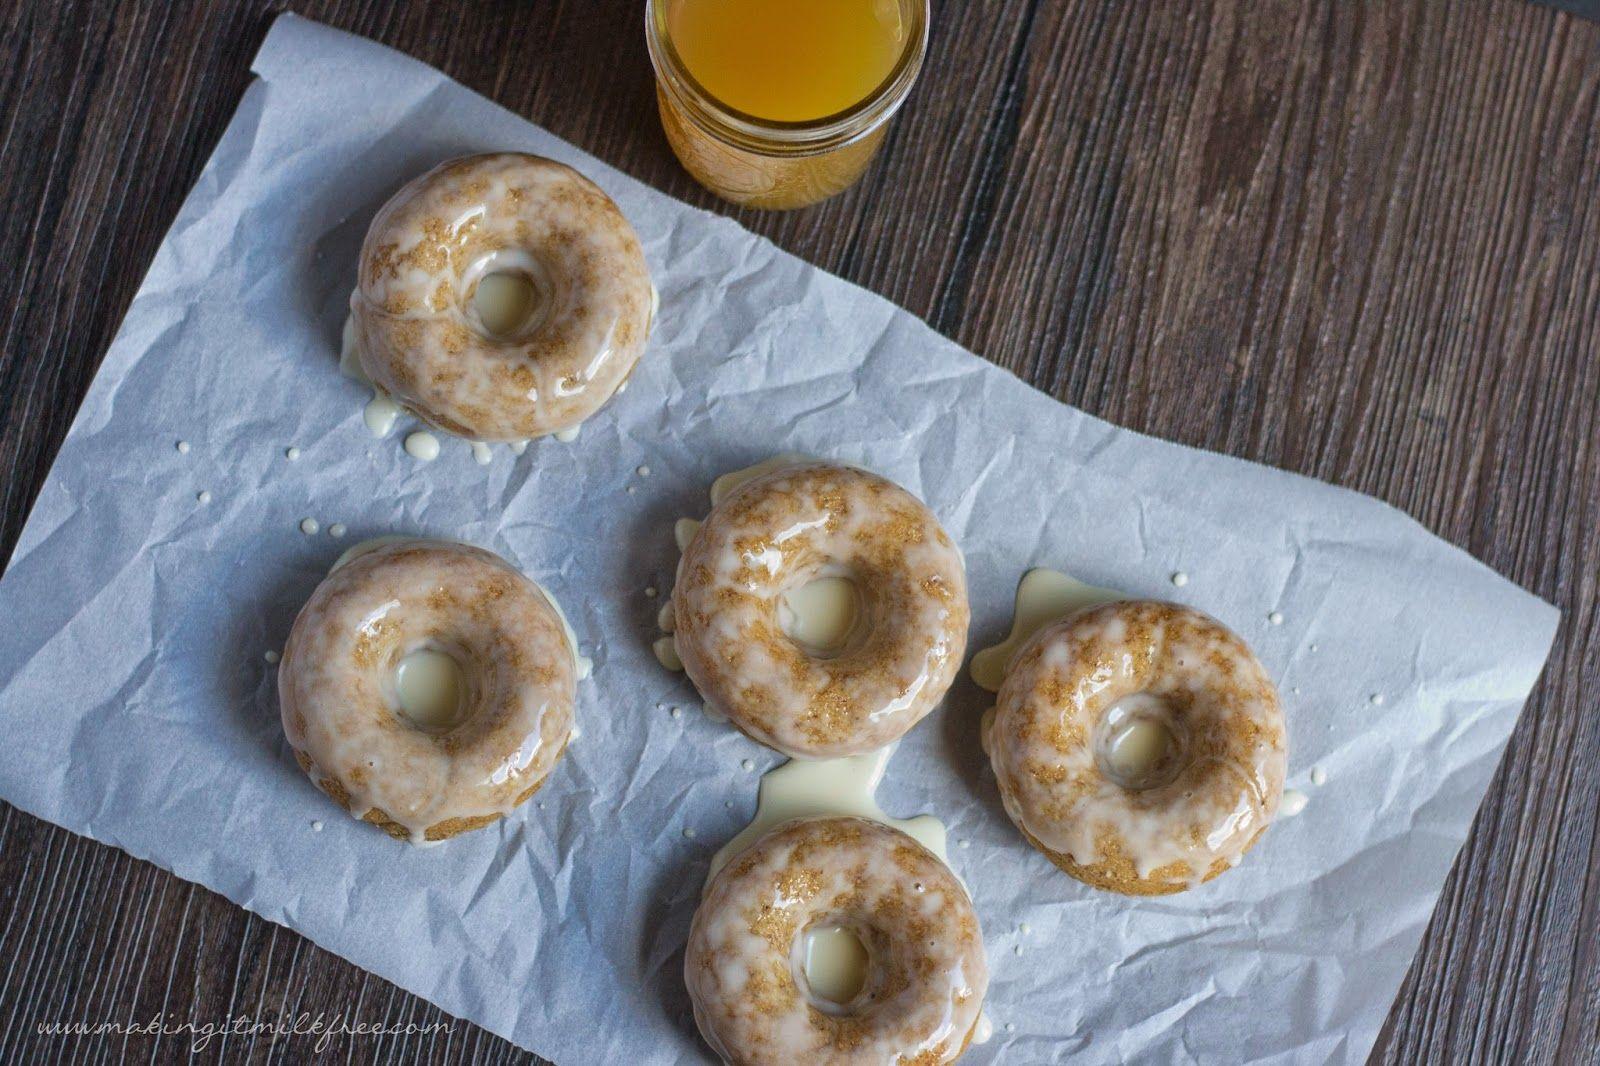 Apple Cider Glazed Donuts {gluten free + vegan} Vegan